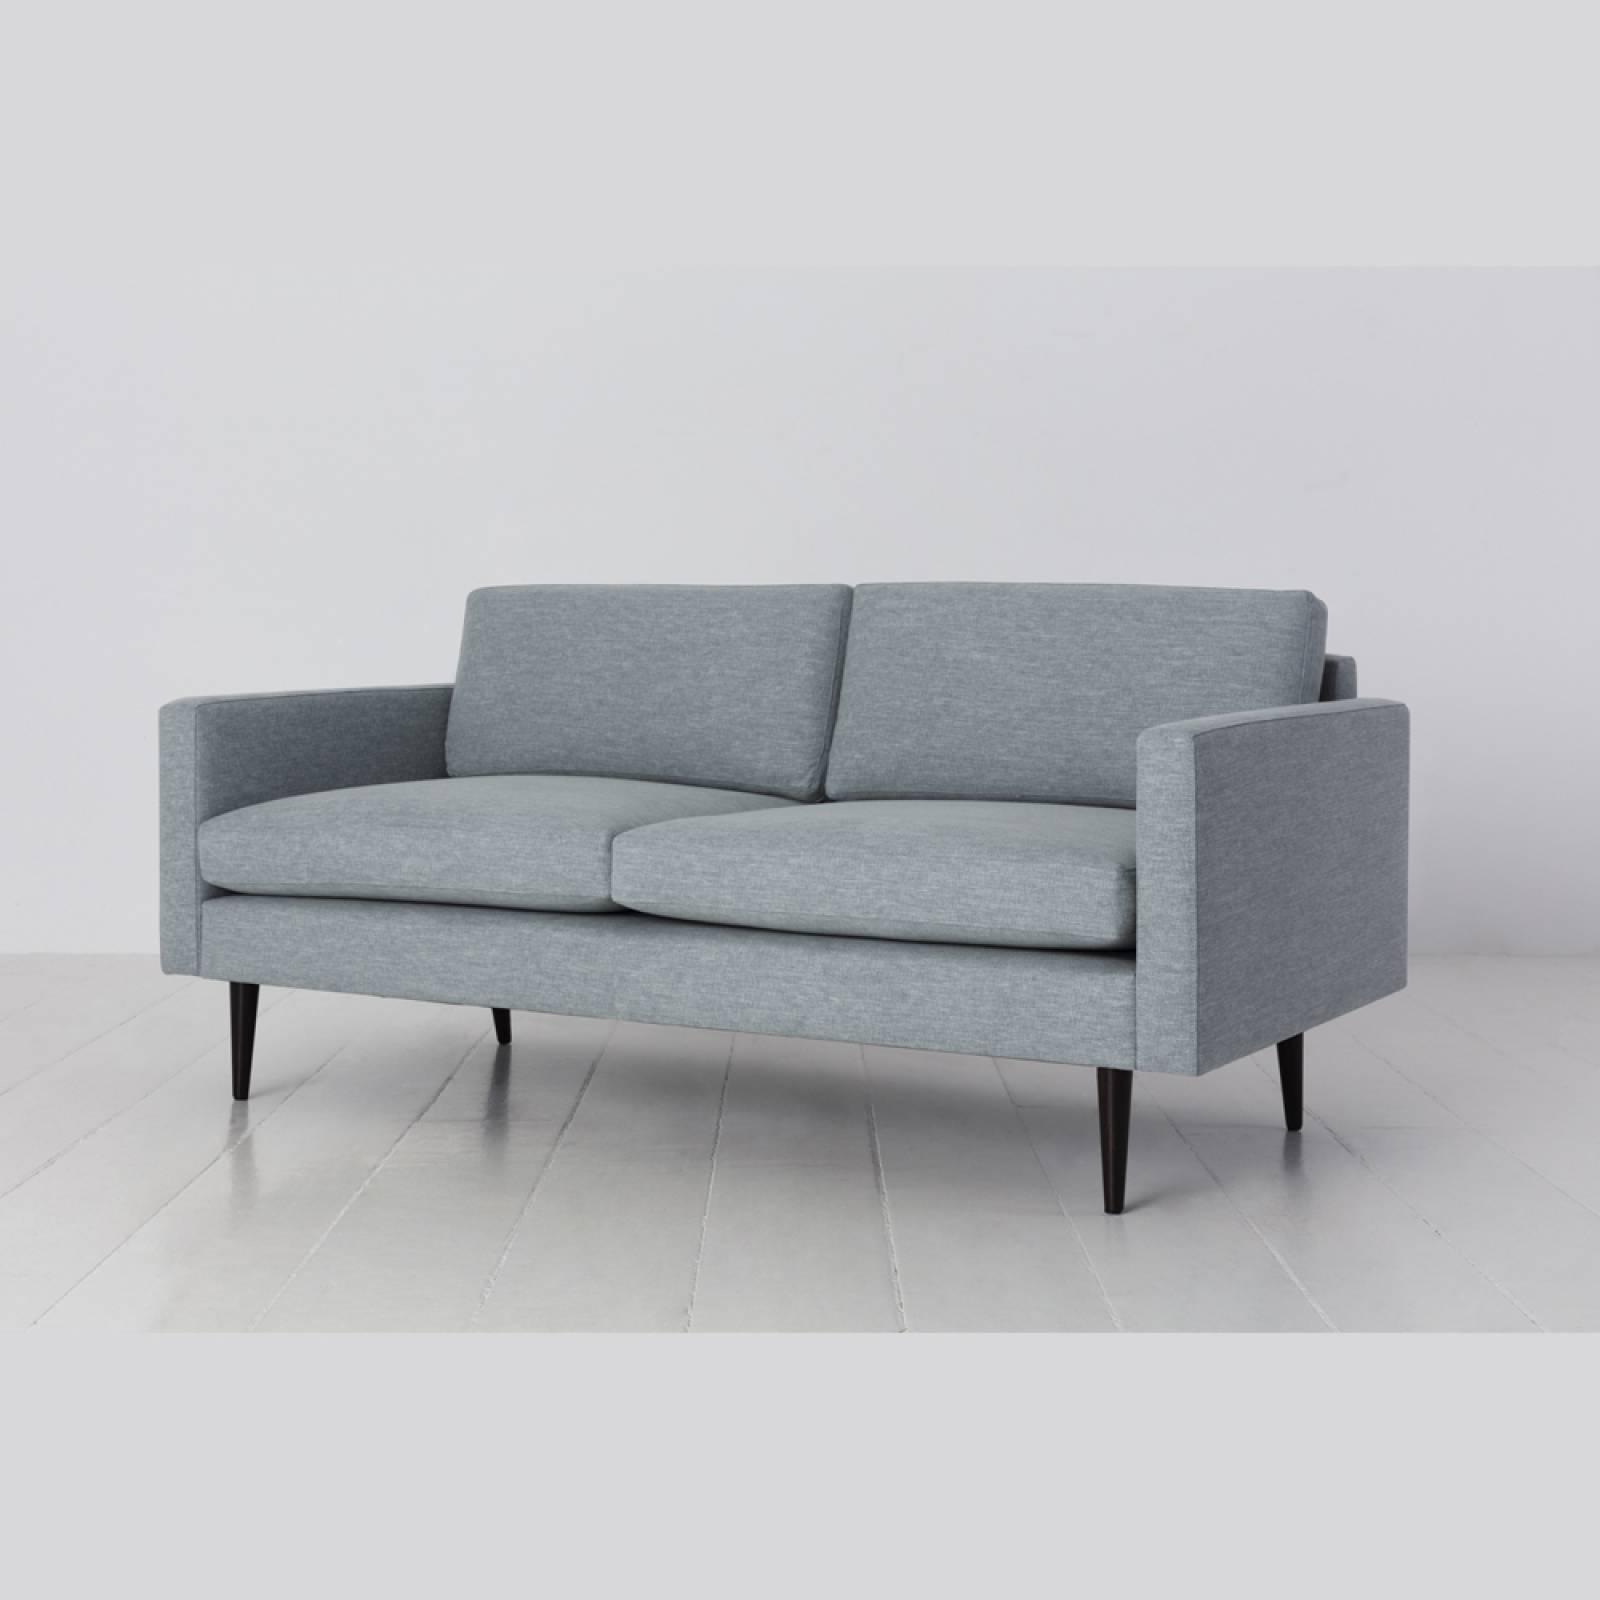 Swyft - Model 01 - 2 Seater Sofa - Linen Seaglass thumbnails